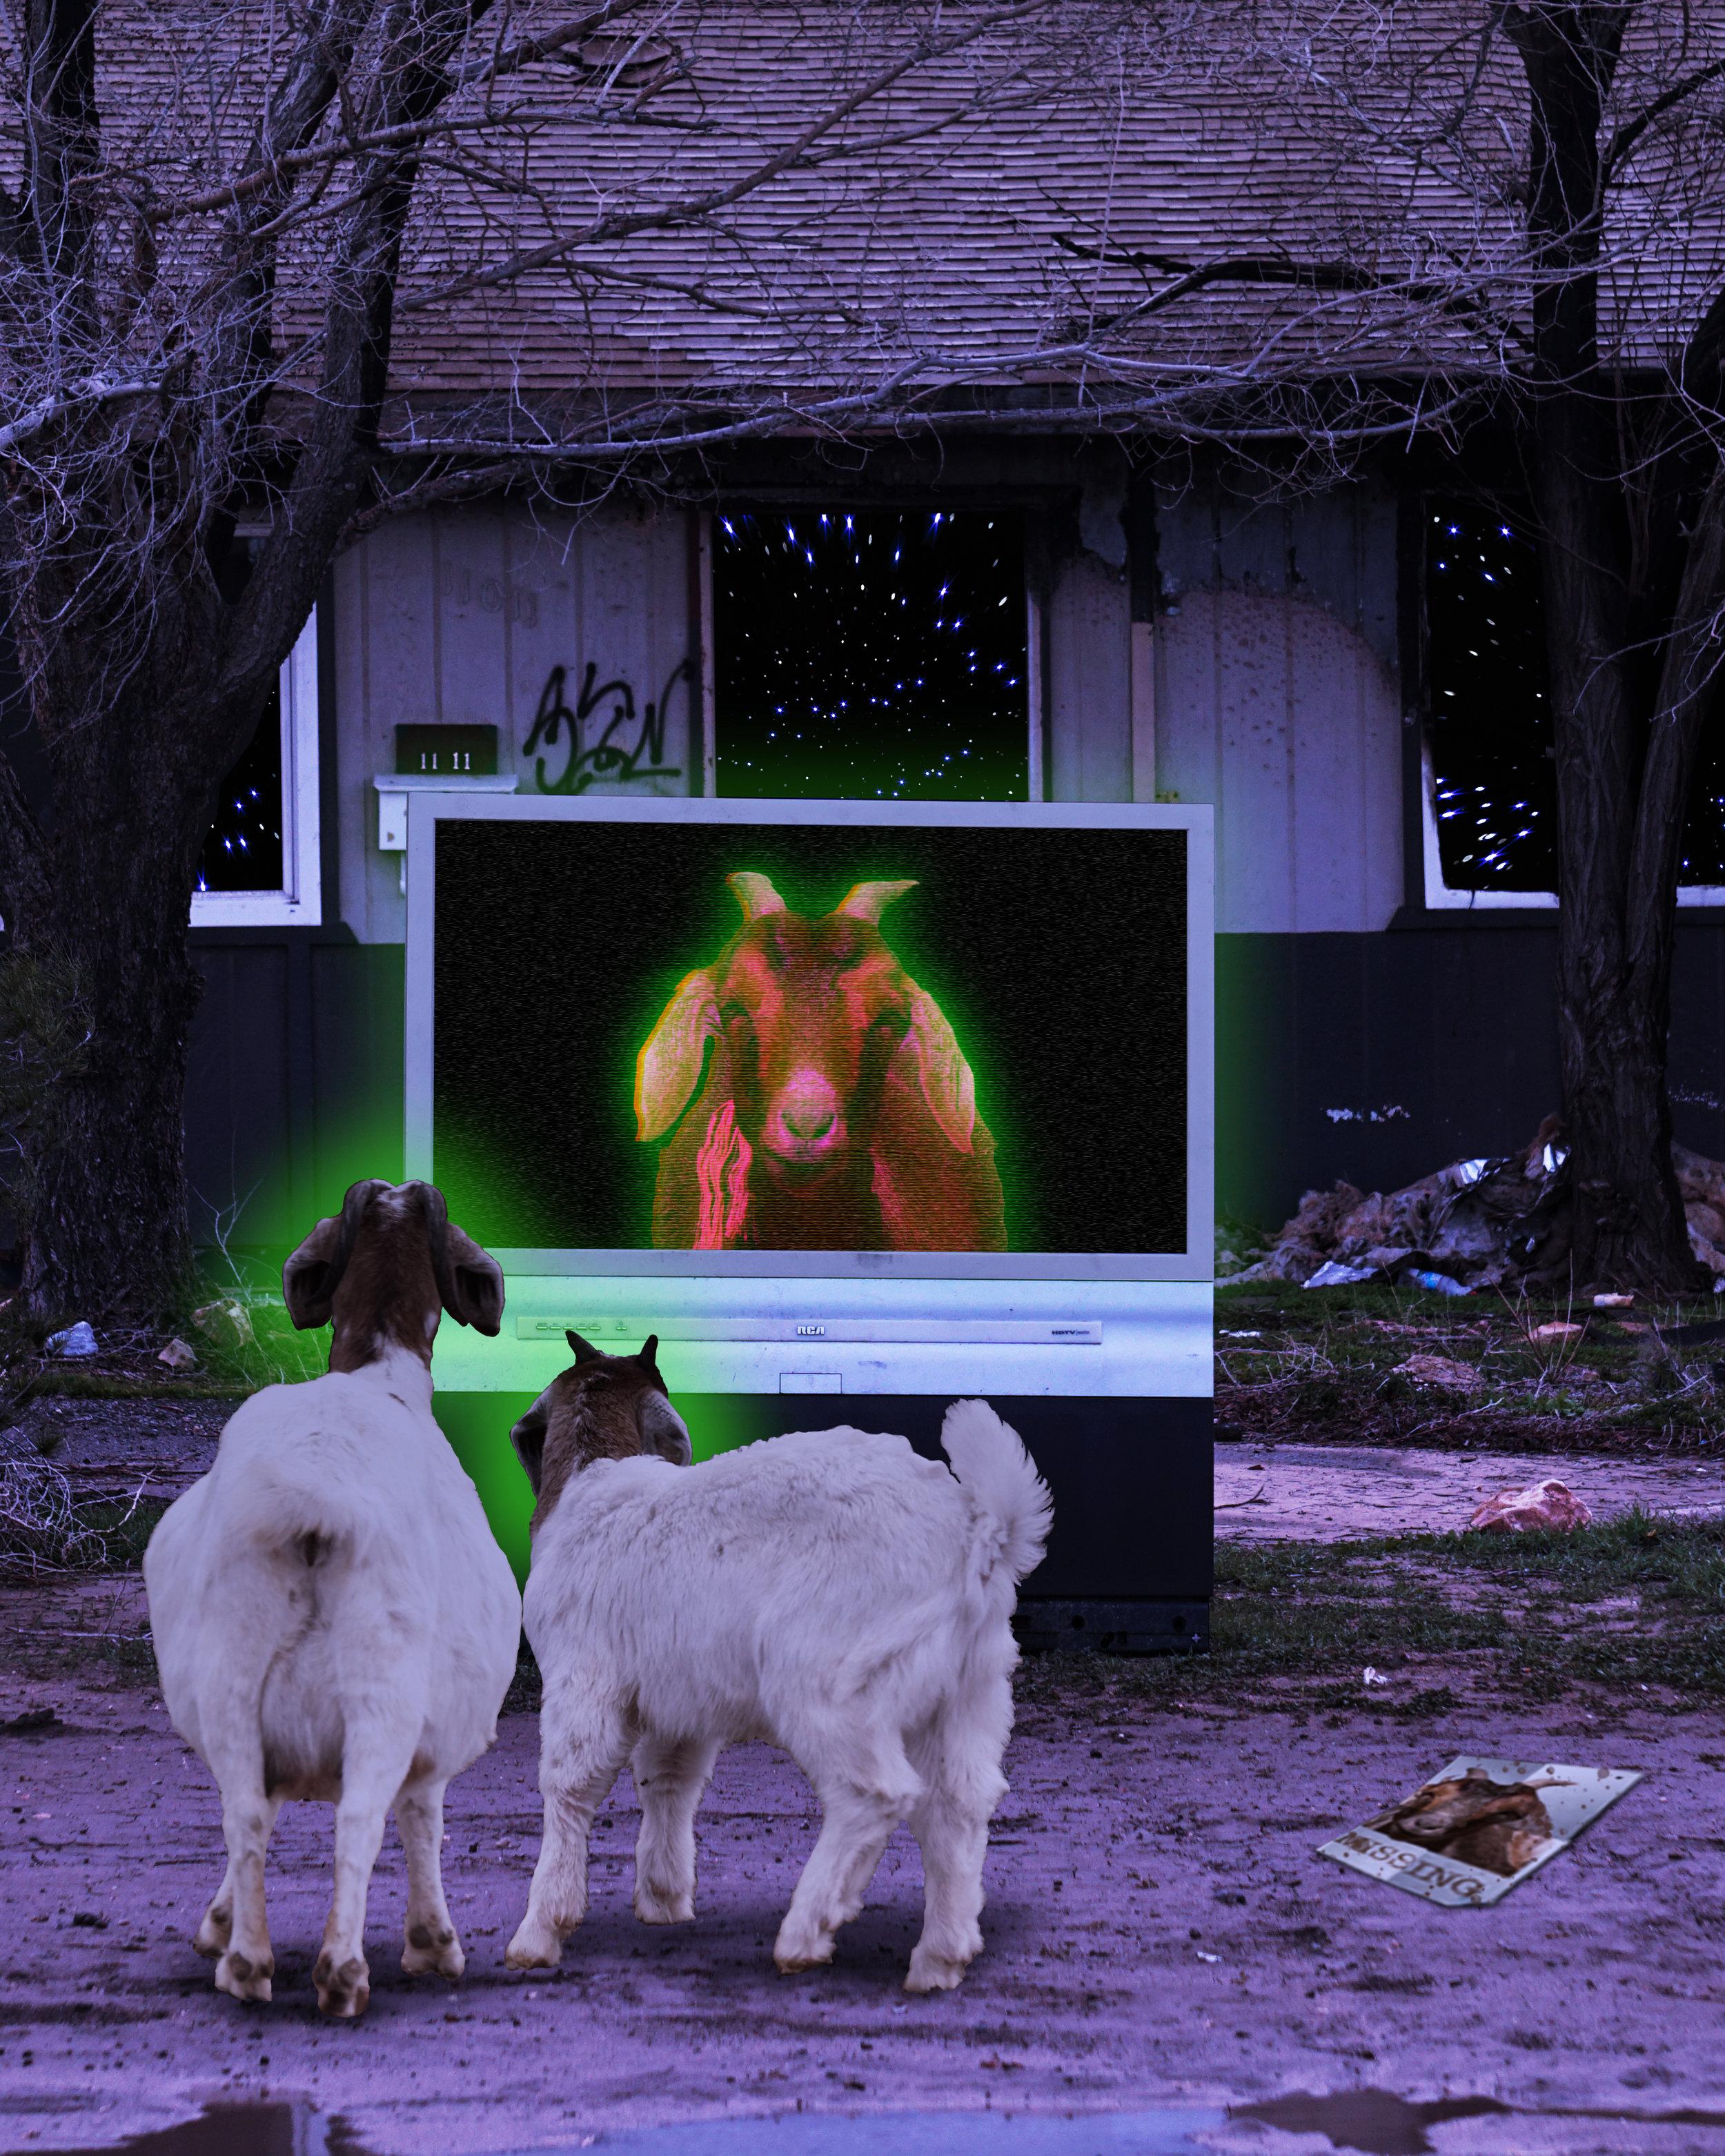 Missing Goat on TV Transmission